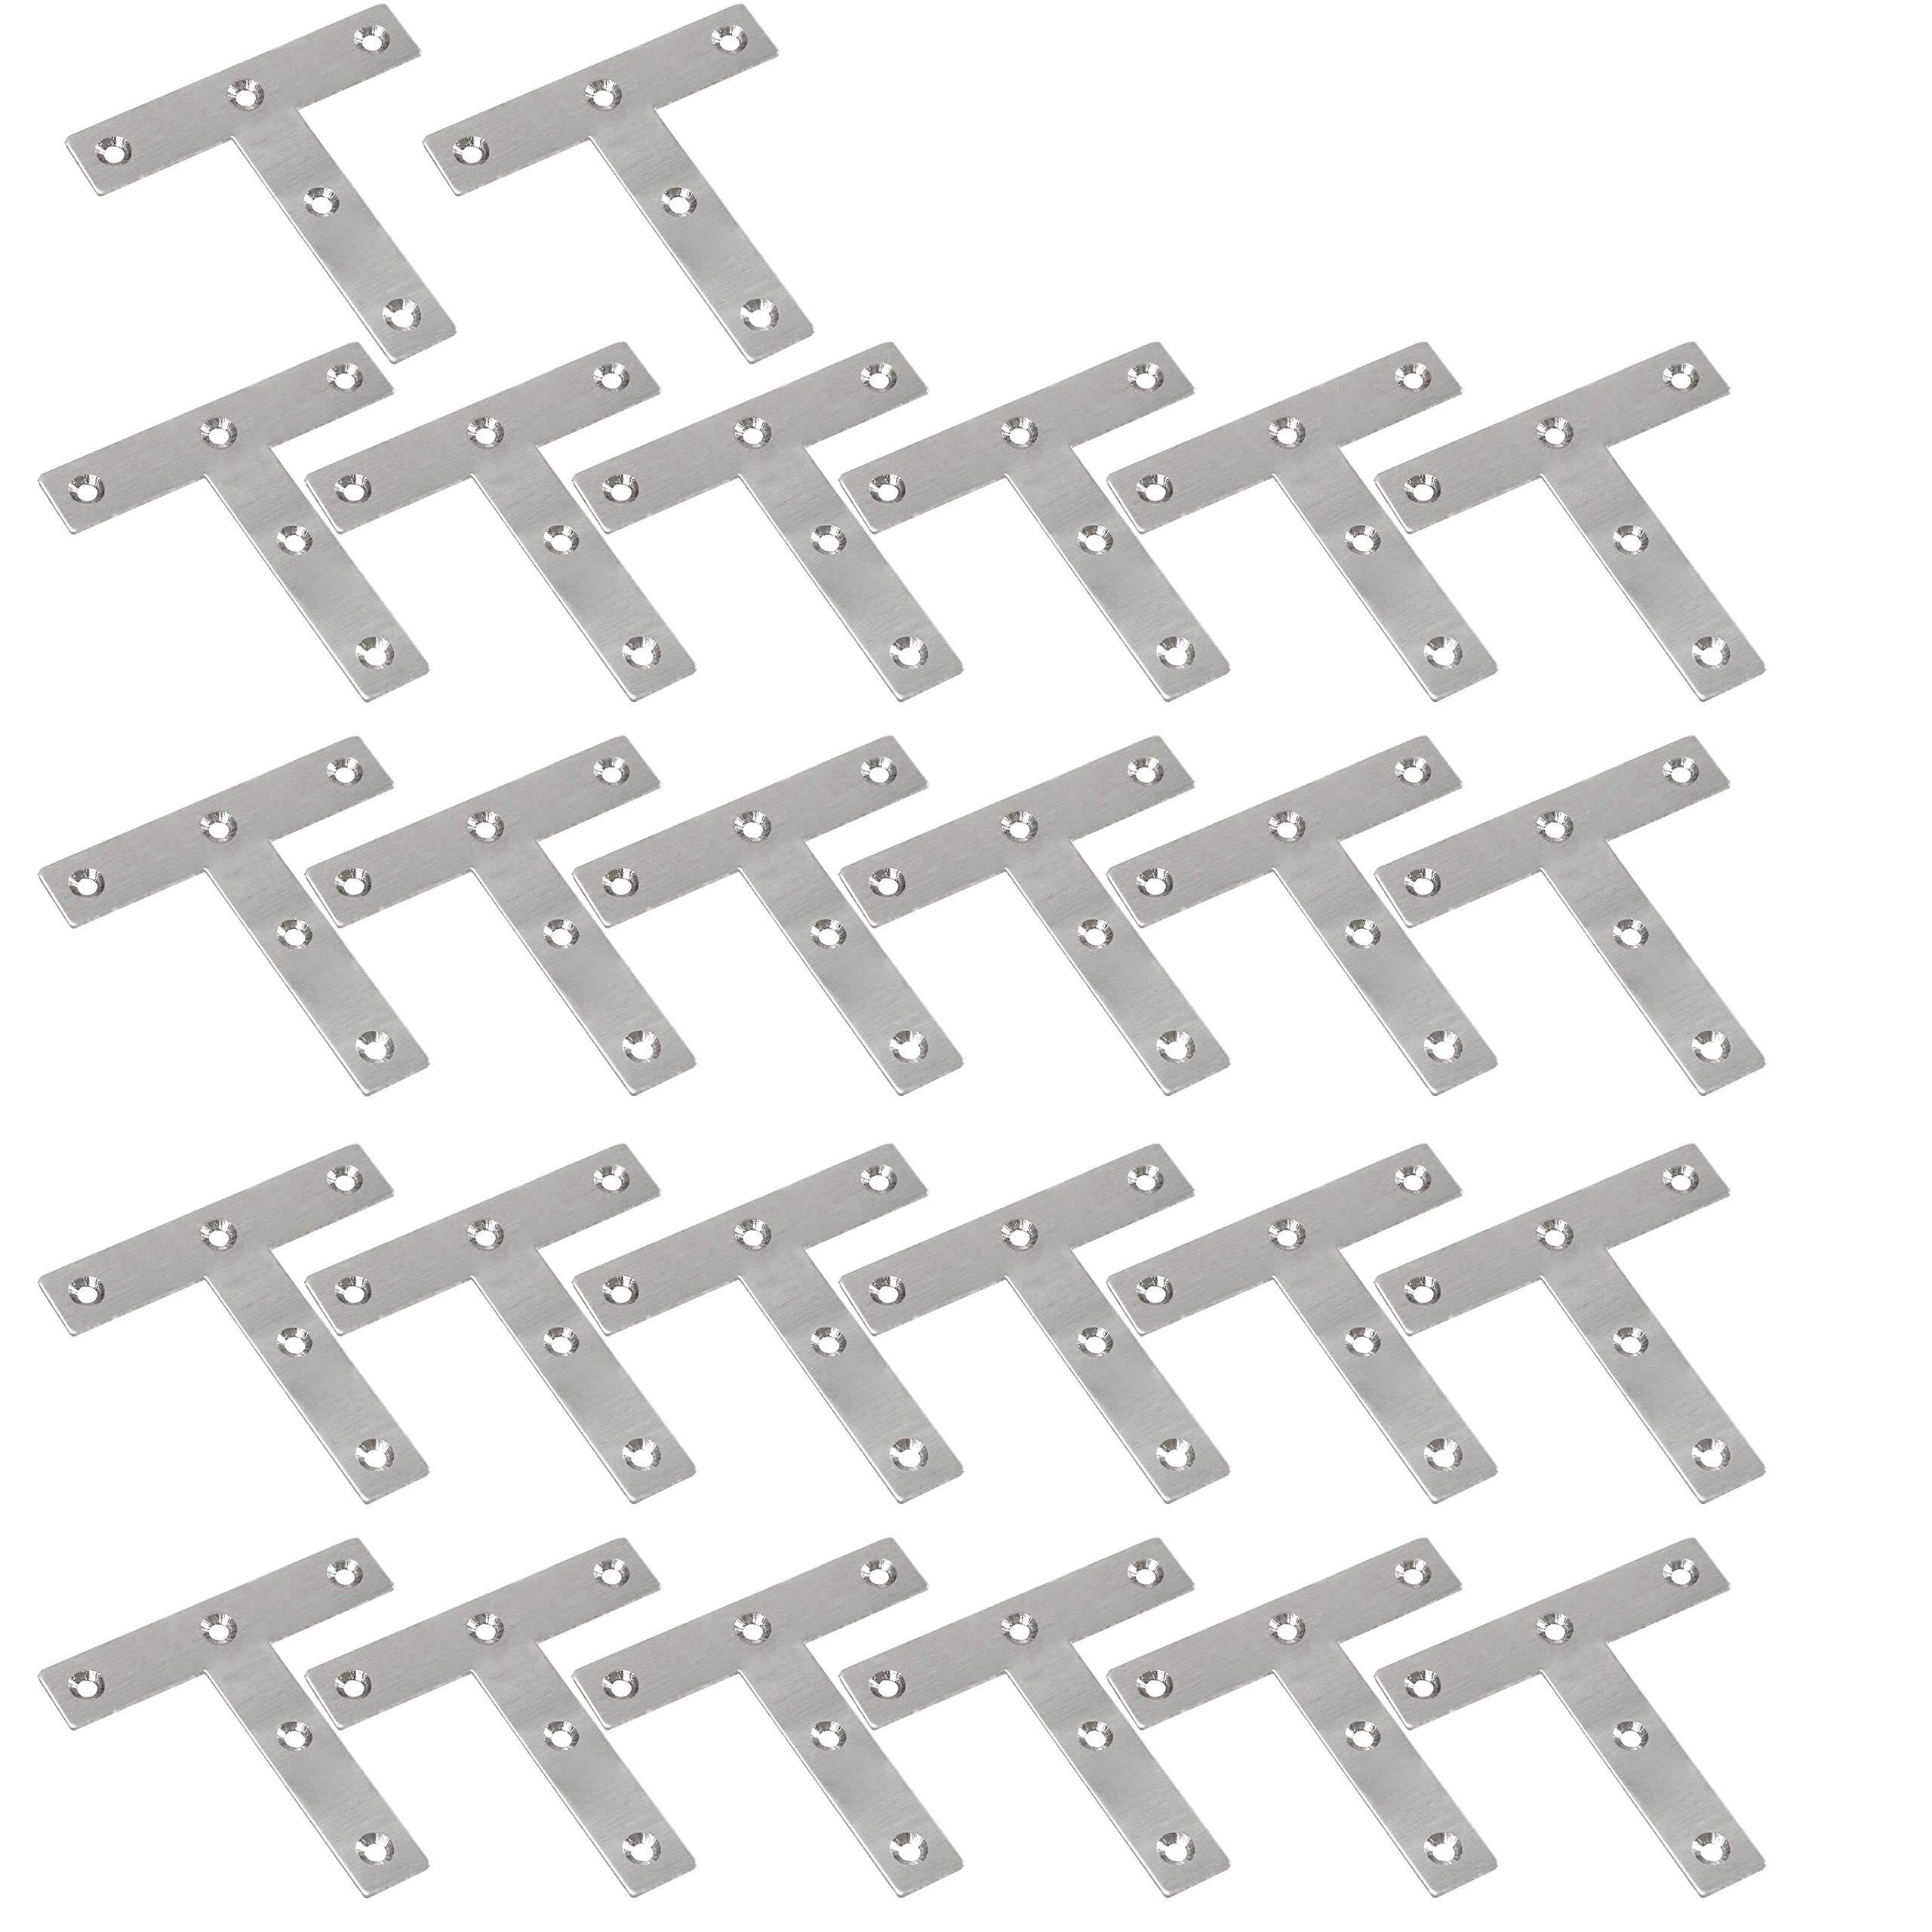 WEBI Heavy Duty Stainless Steel Corner Braces,T Shape Brackets, Joint Fastener, Shelf Support for Wood Furniture, Chests, Screens, Windows, Brushed Finish,26 Pcs,PMJM-T-80X80